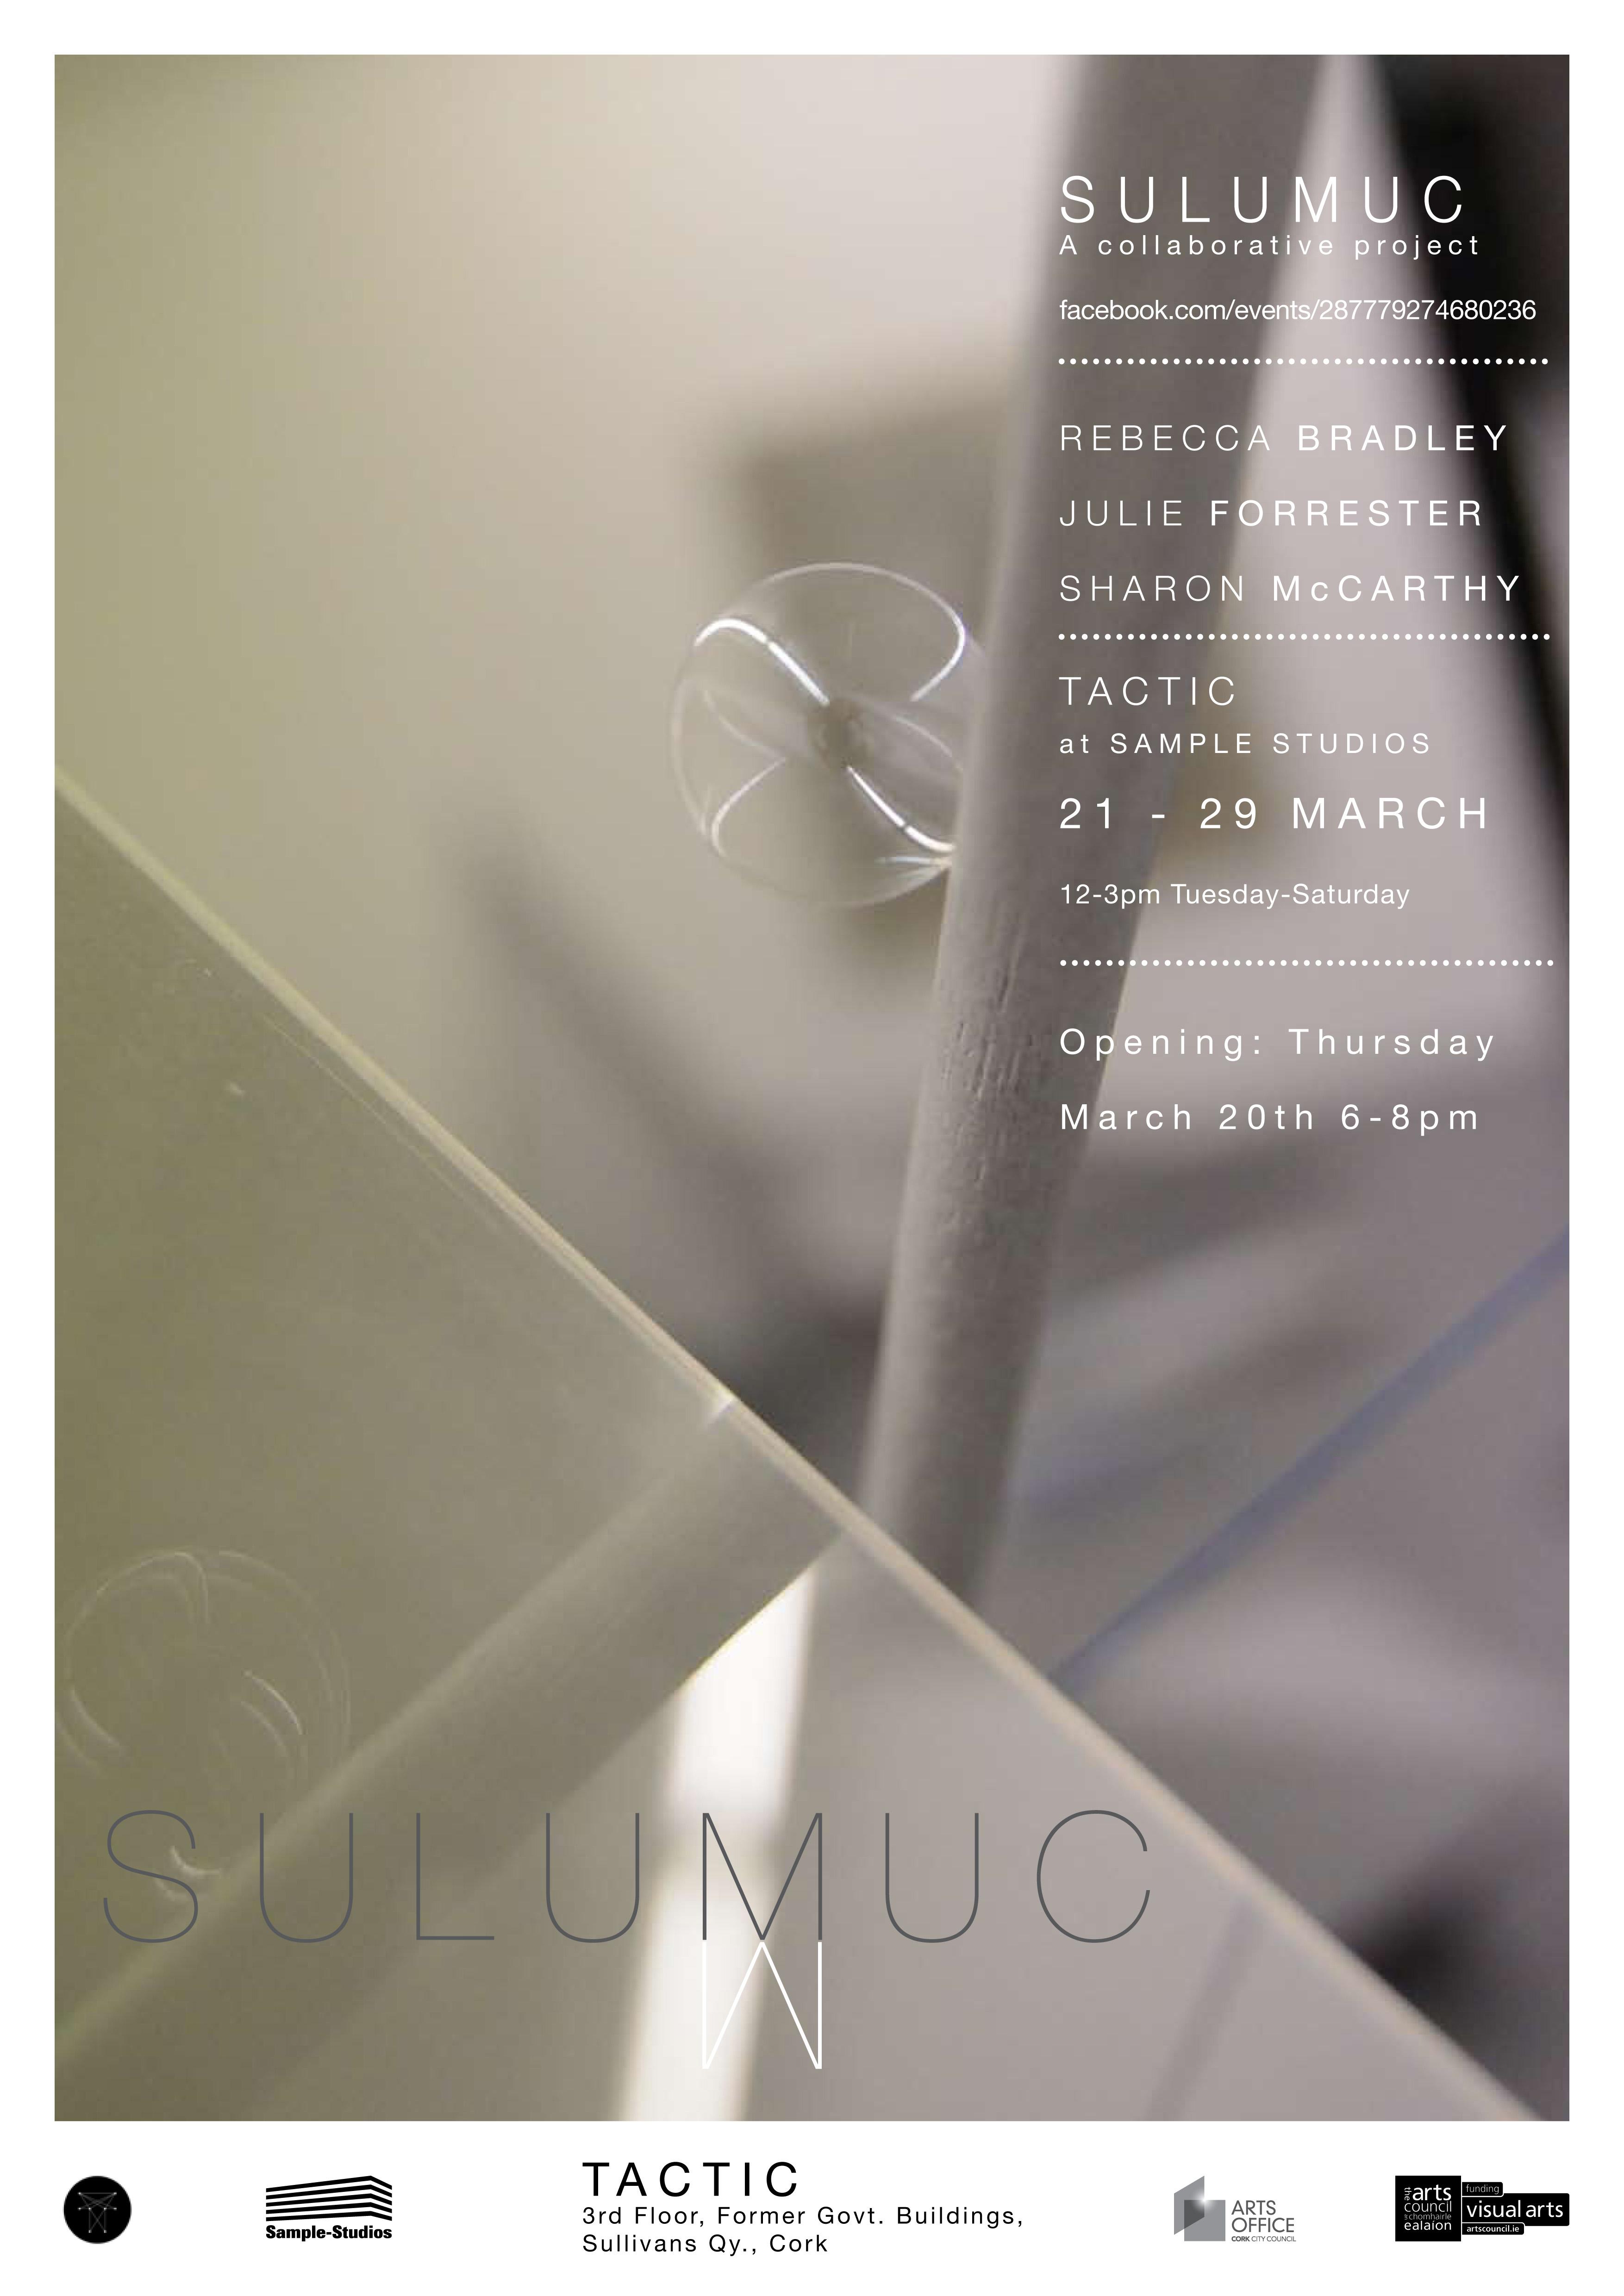 SULUMUC exhibition poster